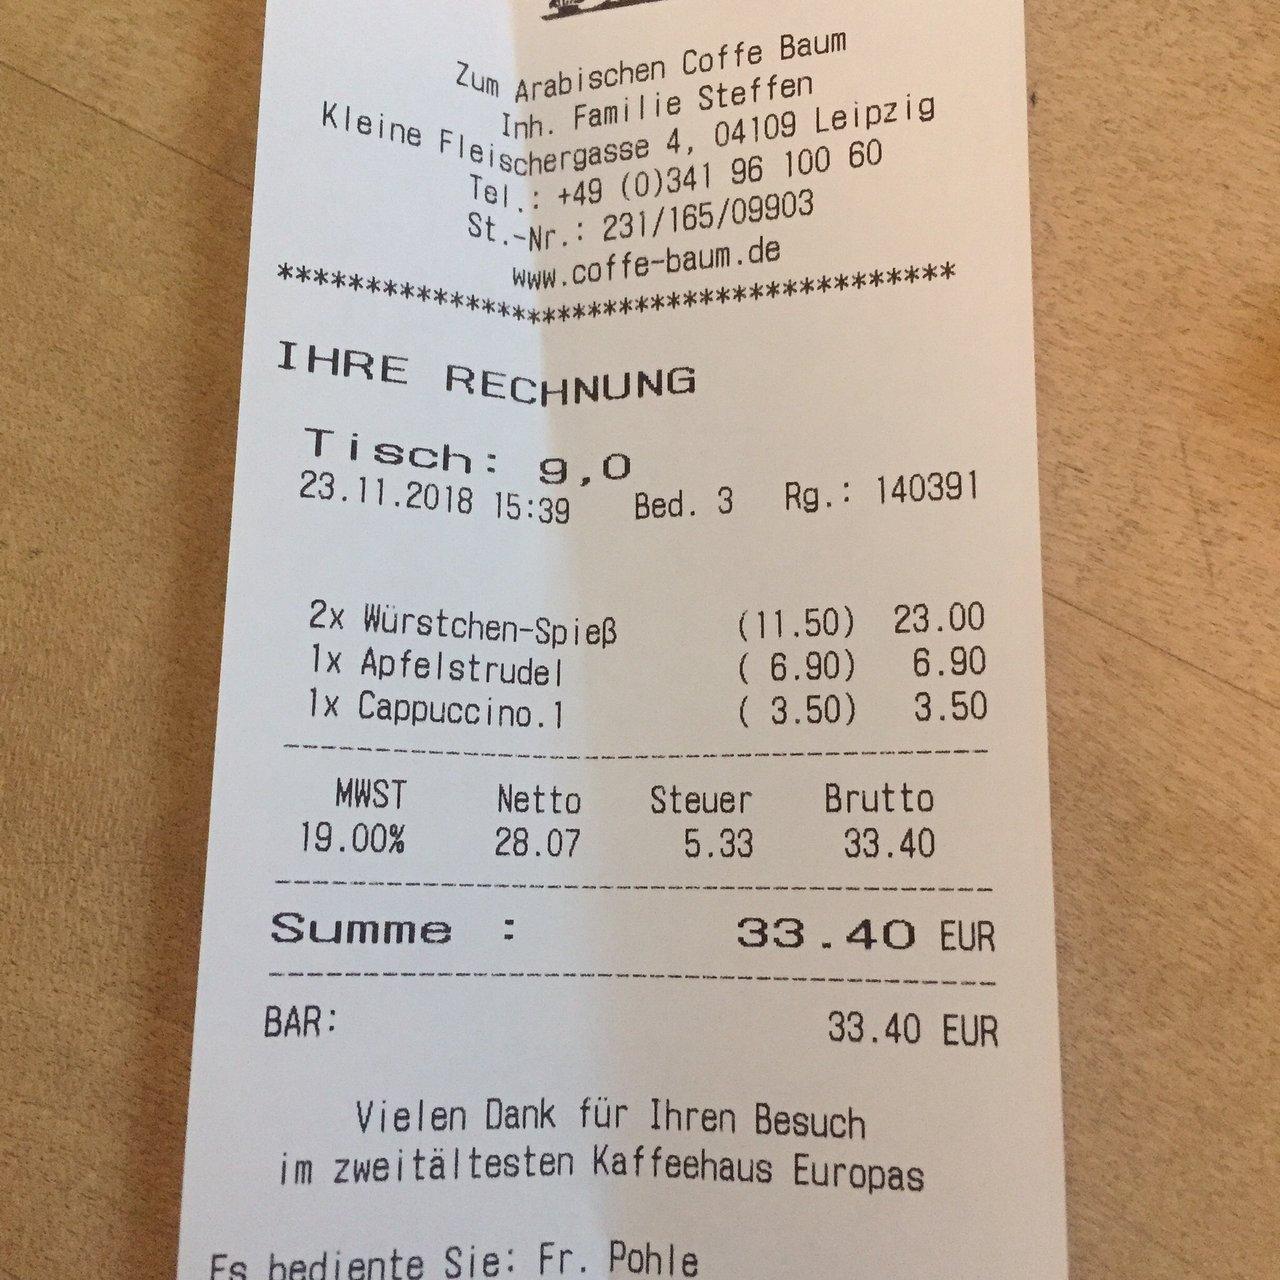 Haus Zum Arabischen Coffe Baum Leipzig 2020 All You Need To Know Before You Go With Photos Tripadvisor